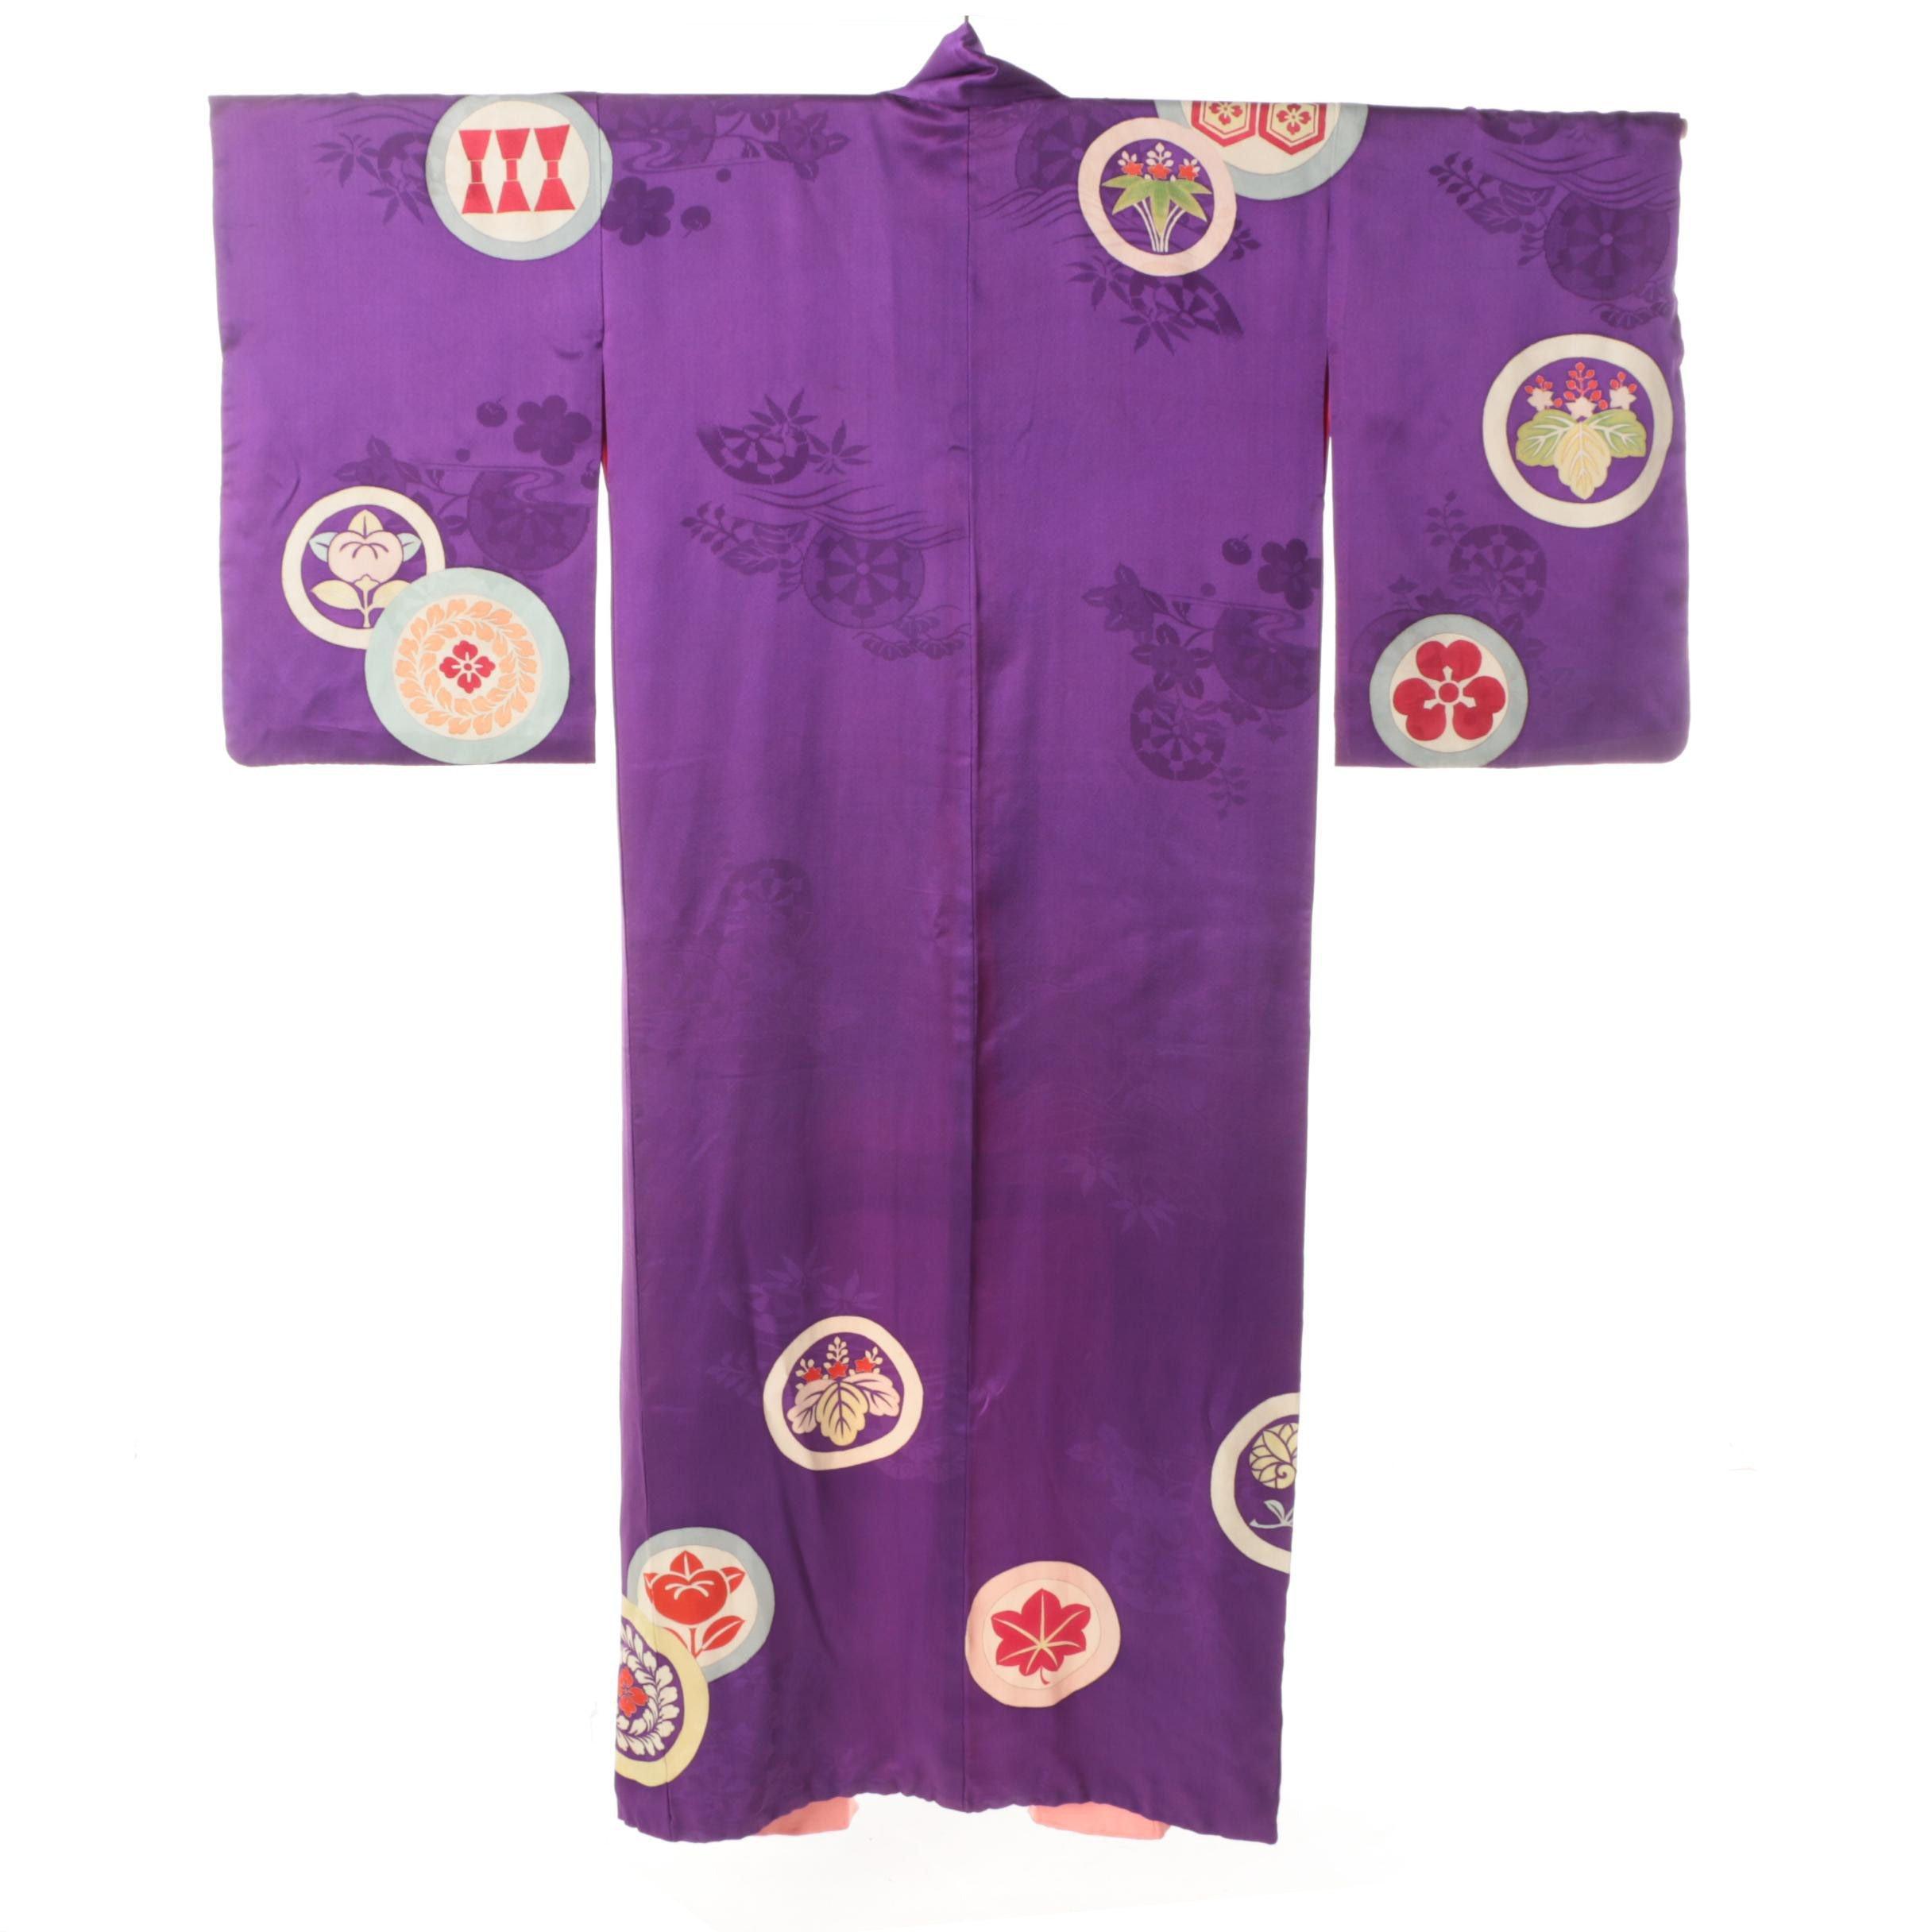 Circa 1920s Vintage Japanese Silk Damask Kimono